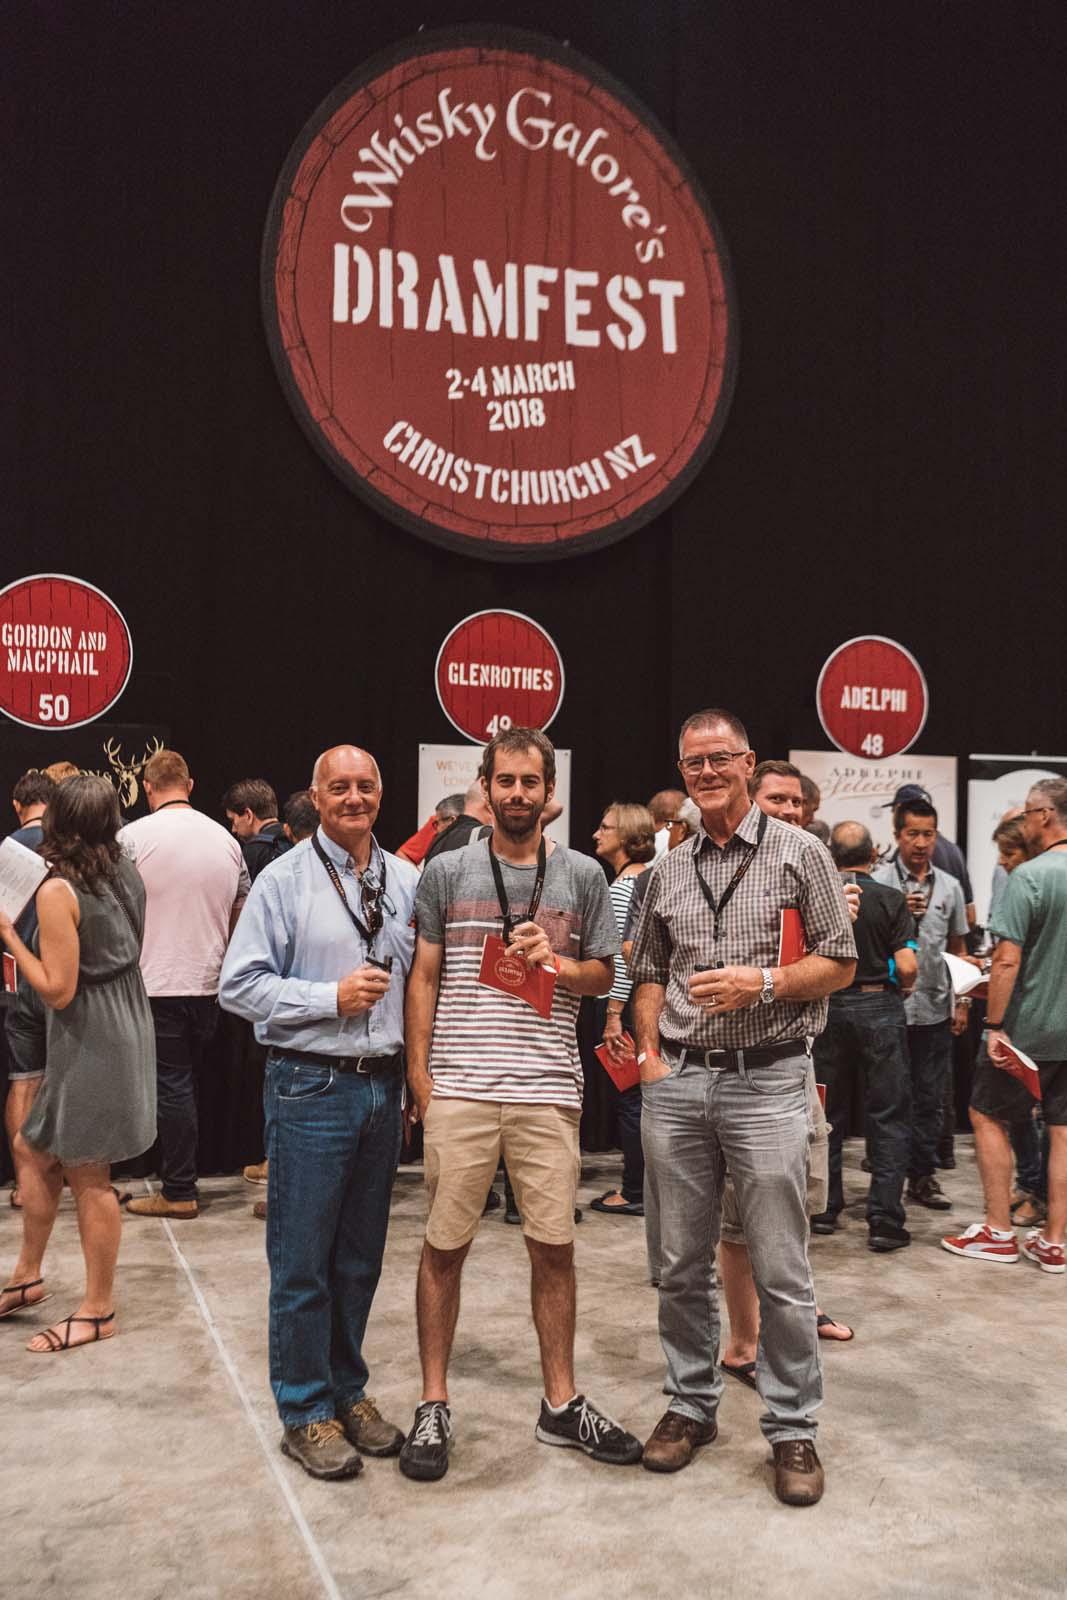 Dramfest 2018 for Whisky Galore-339.jpg